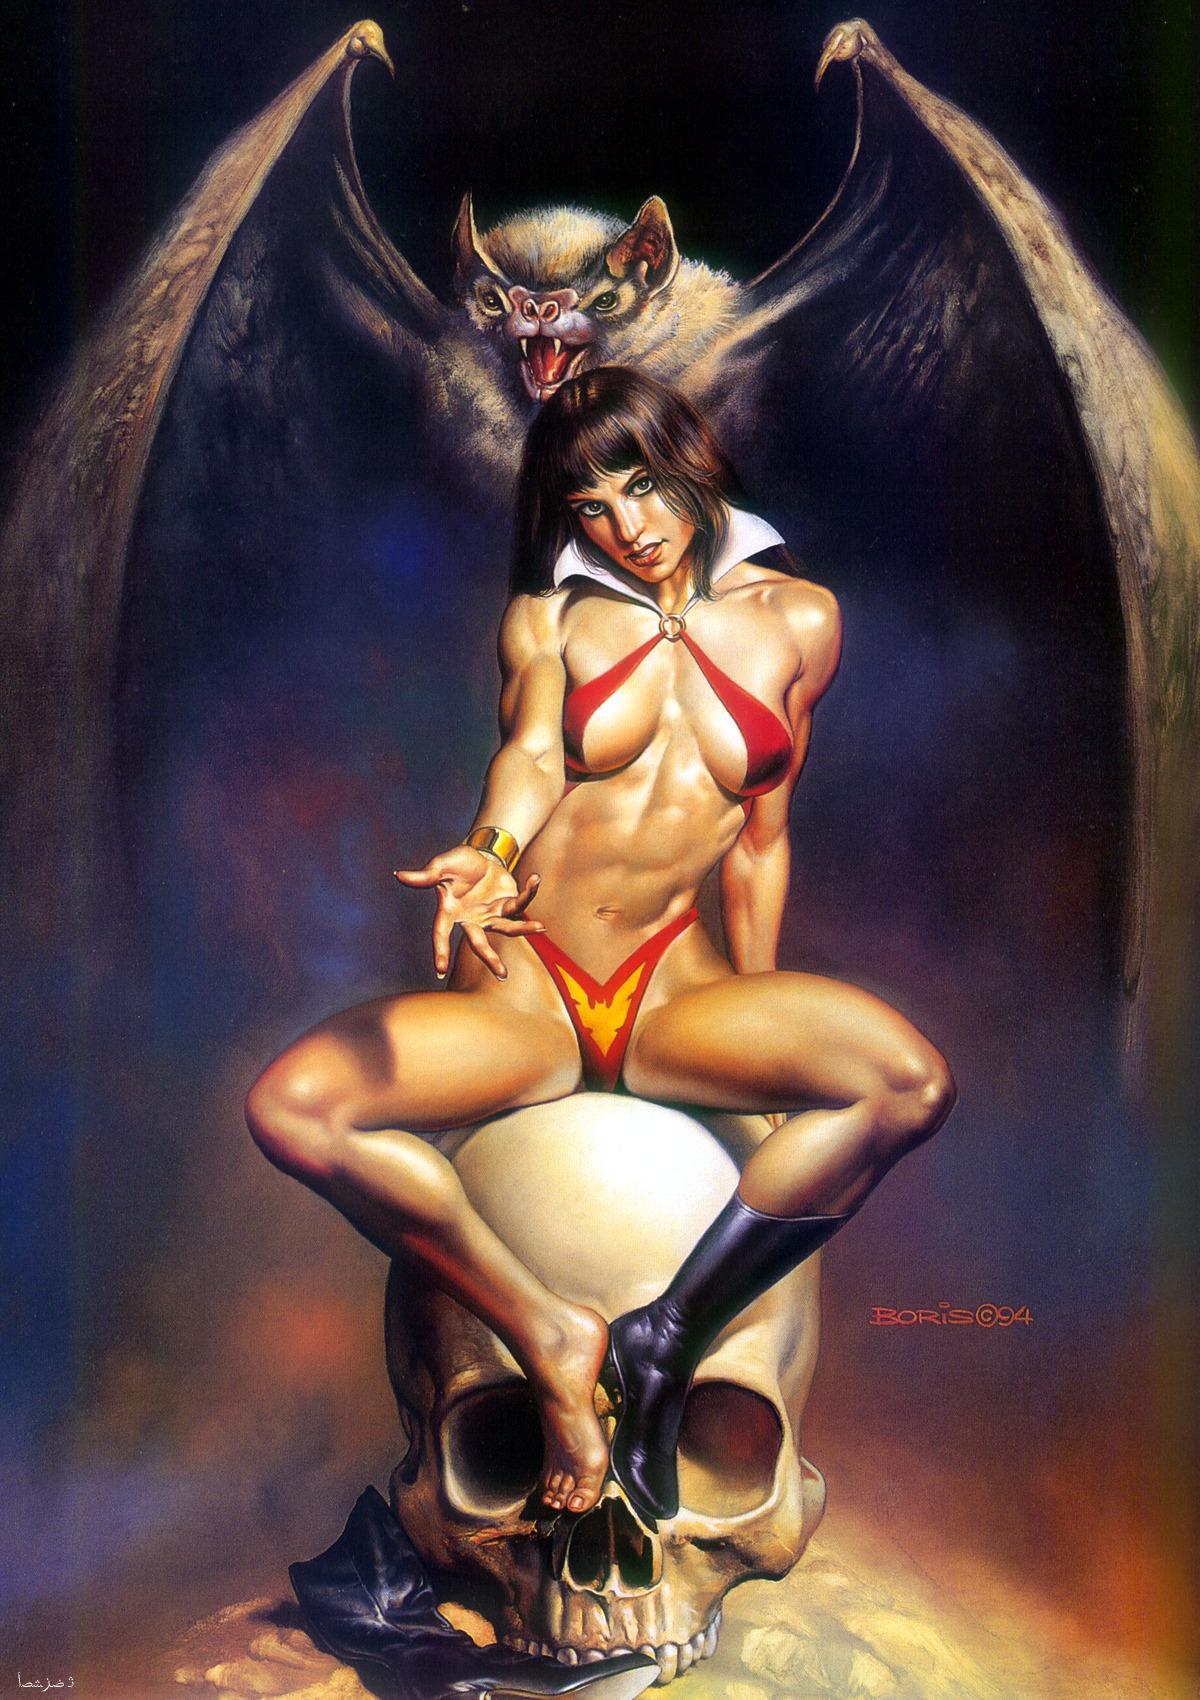 Vampier hotsex movie erotic video